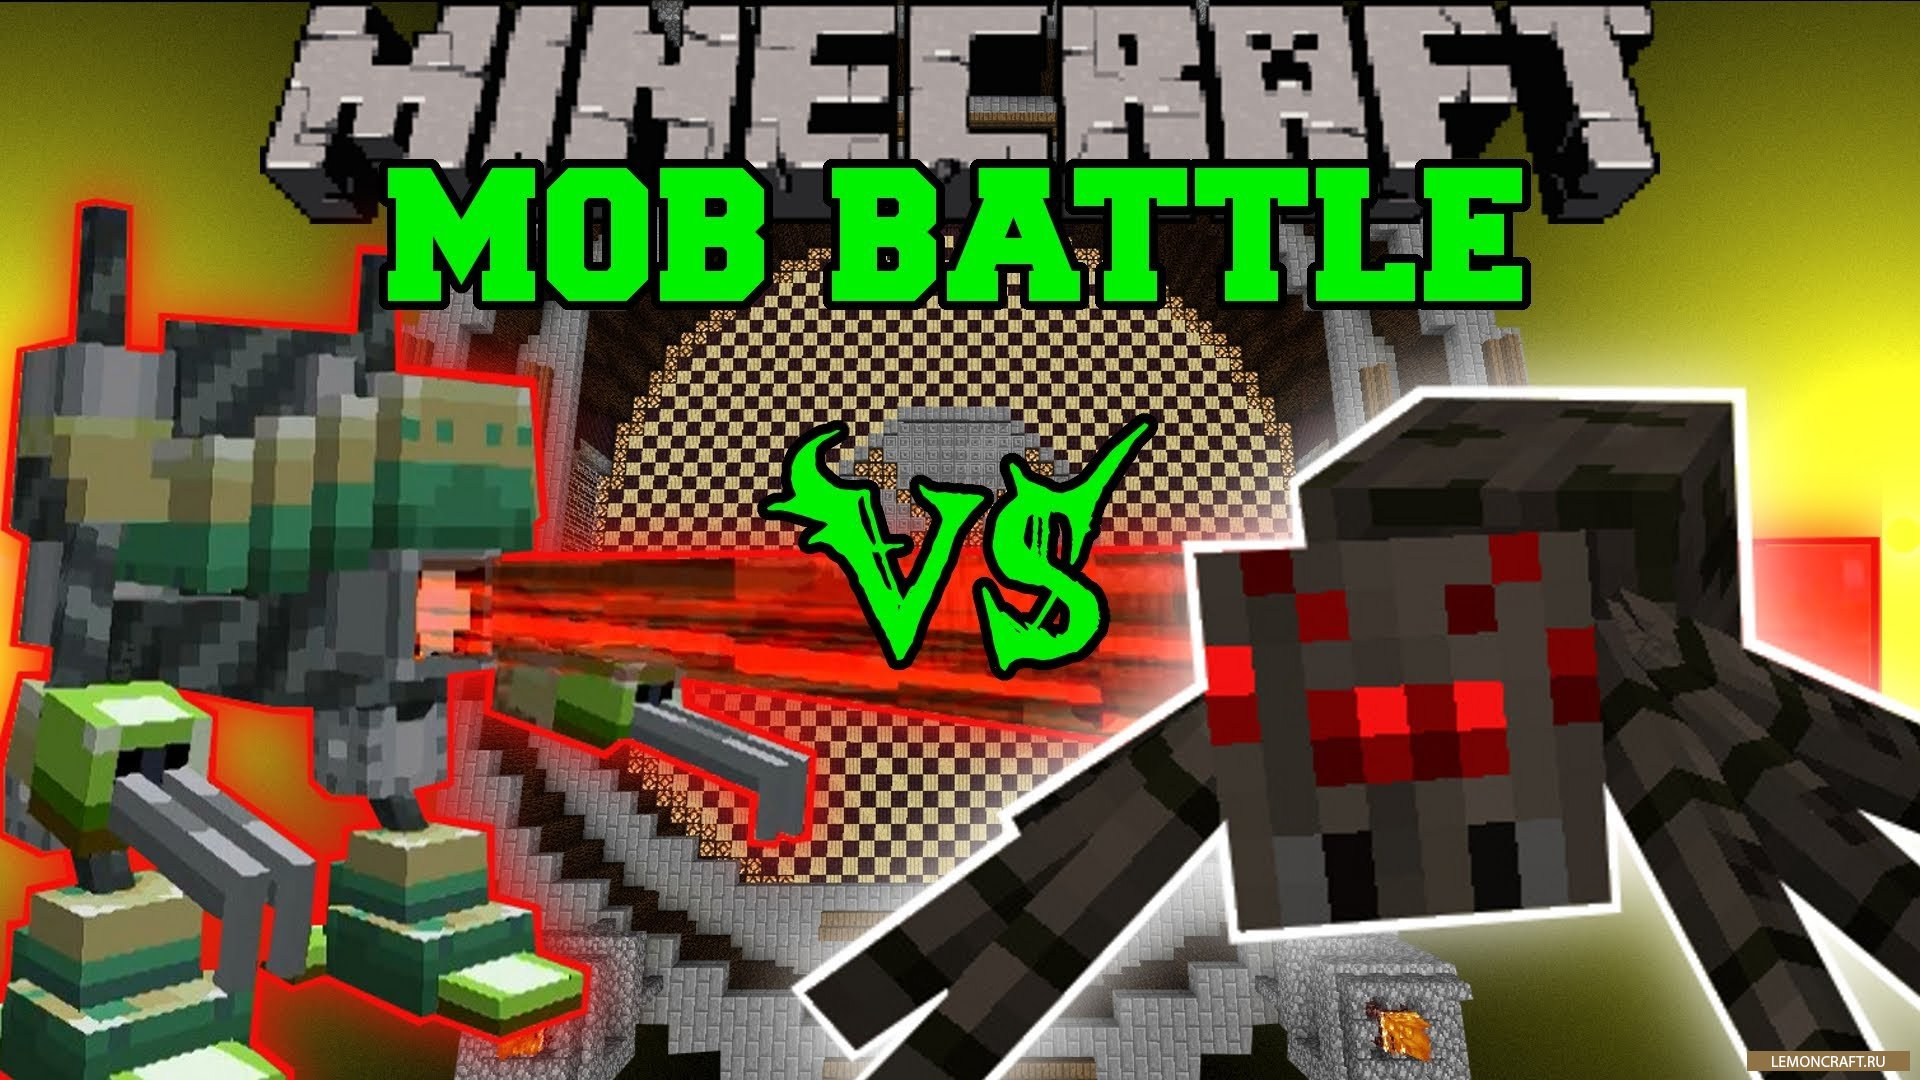 Мод на бои между мобами Mob Battle [1.12.2] [1.11.2] [1.10.2] [1.7.10]